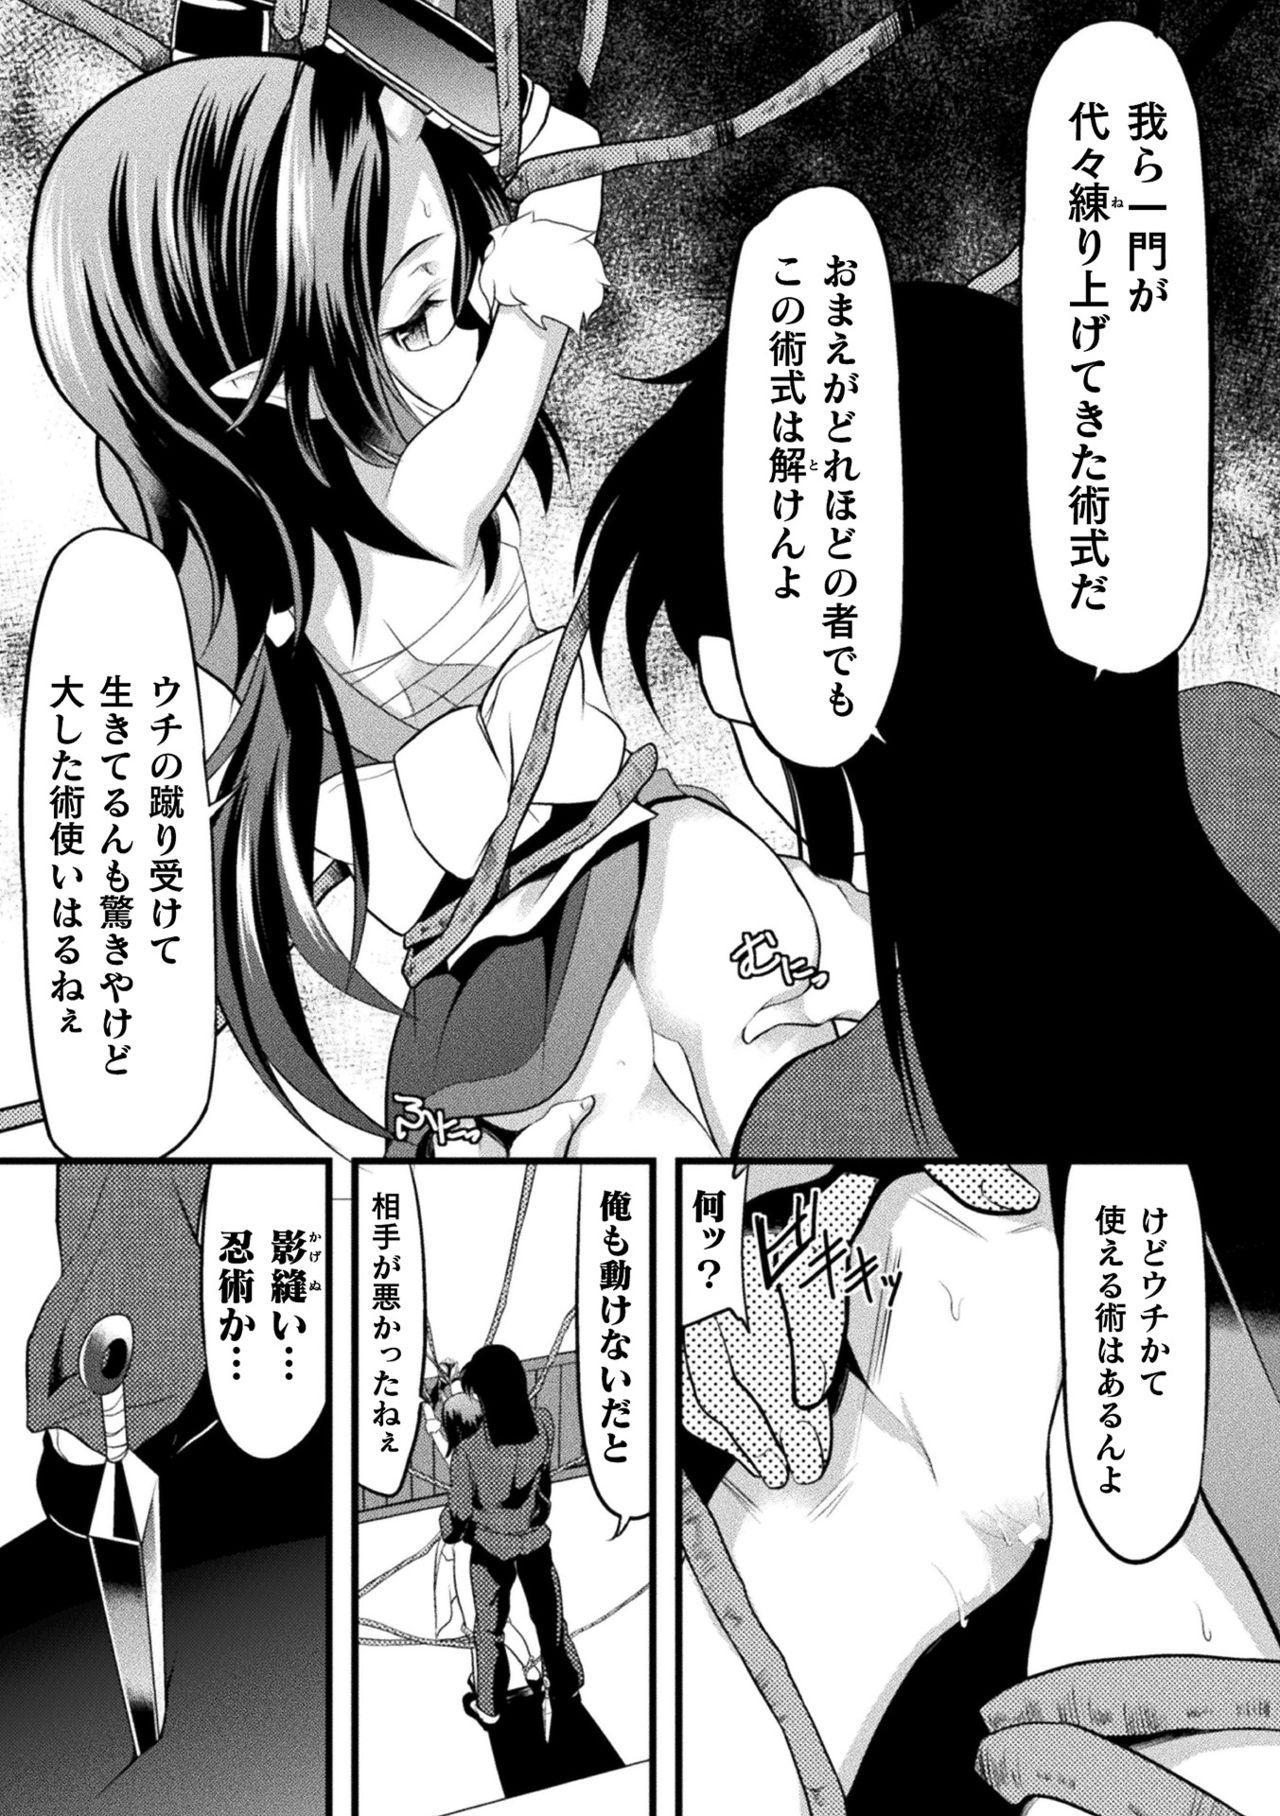 Loli-babaa Kyousei Tanetsuke Ecchi! Vol. 2 26